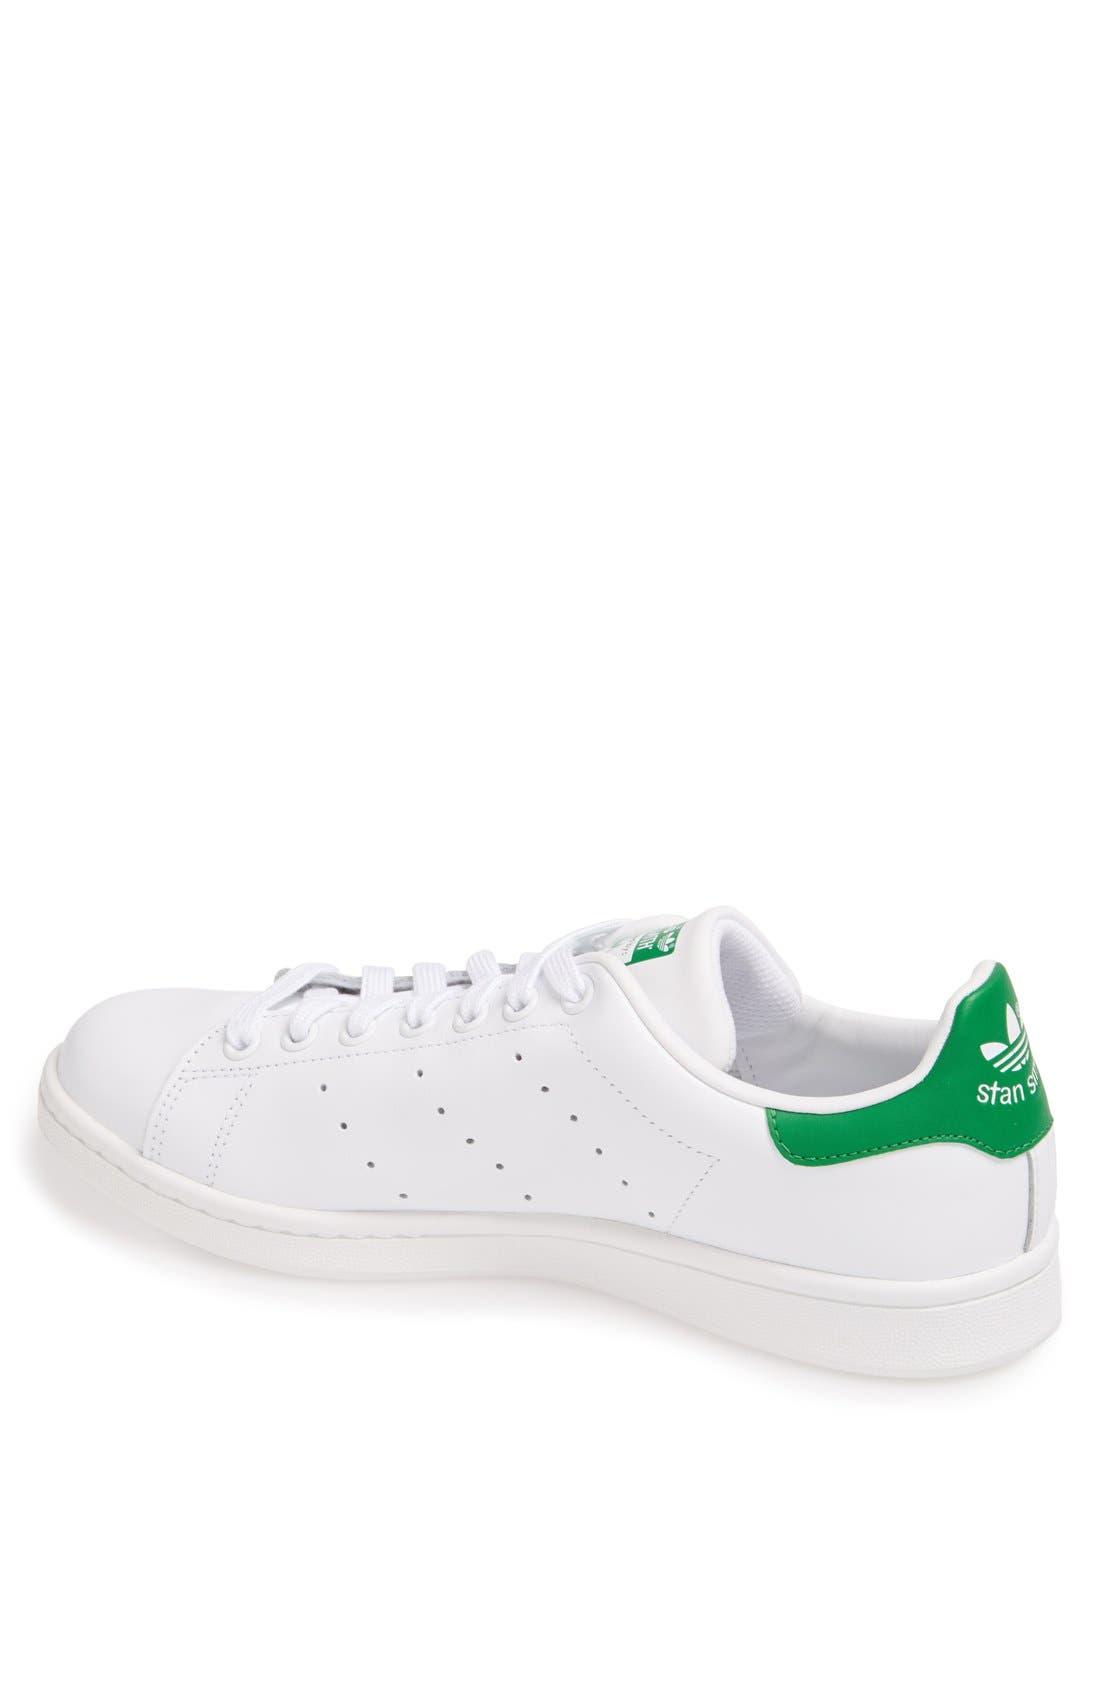 'Stan Smith' Sneaker,                             Alternate thumbnail 3, color,                             100